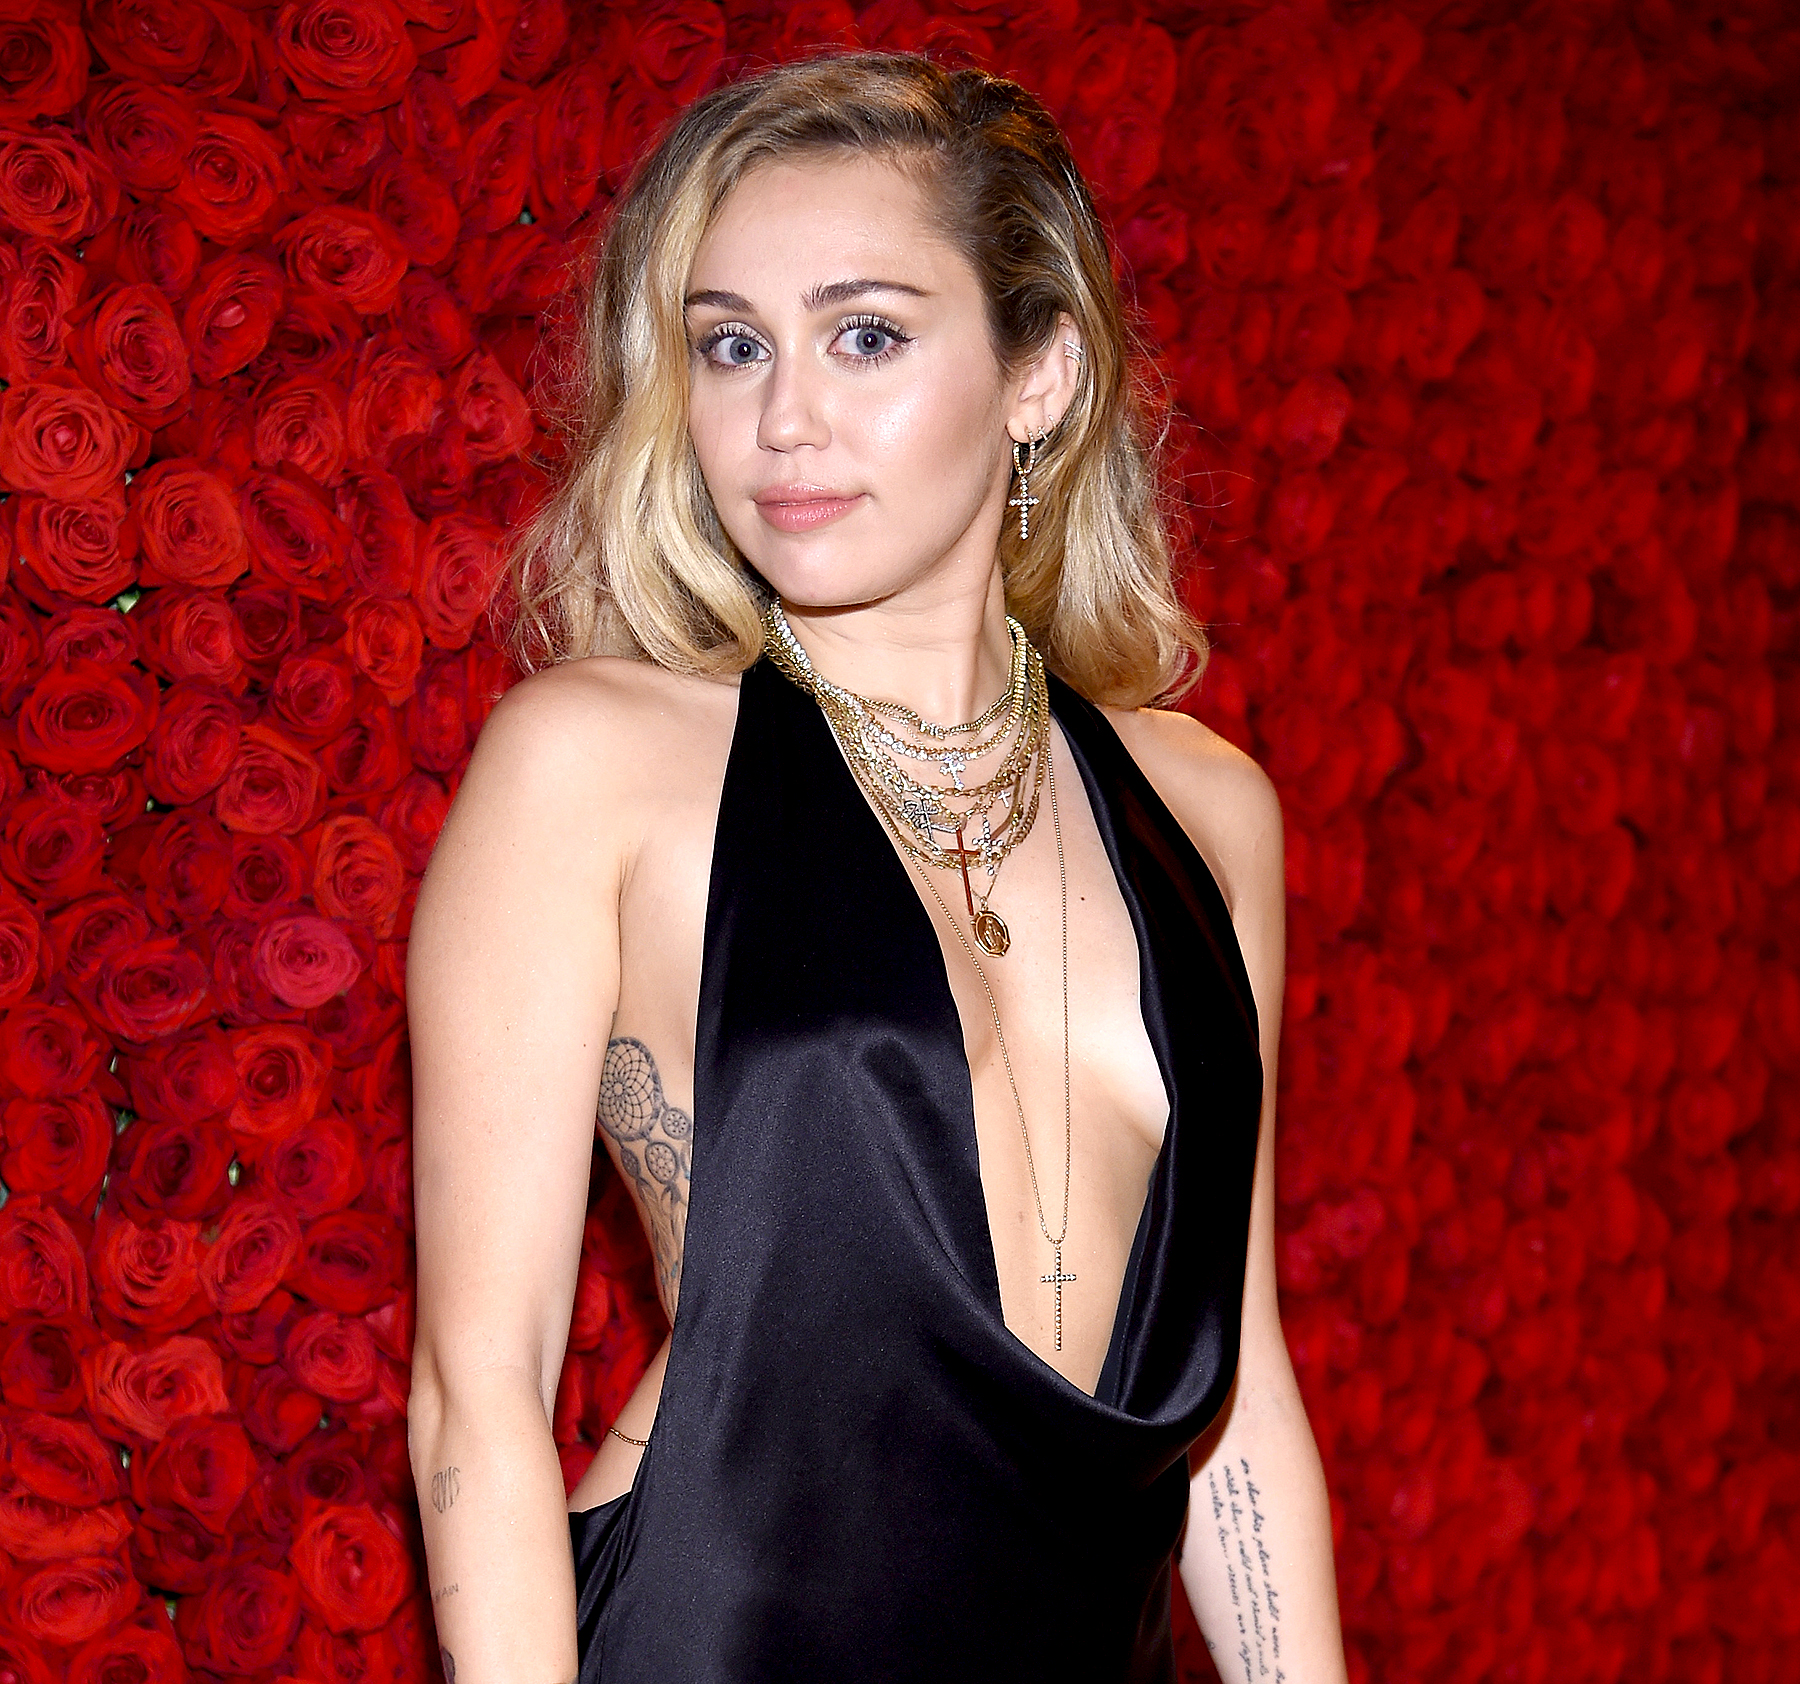 Photos Miley Cyrus nudes (36 photo), Tits, Bikini, Selfie, butt 2018